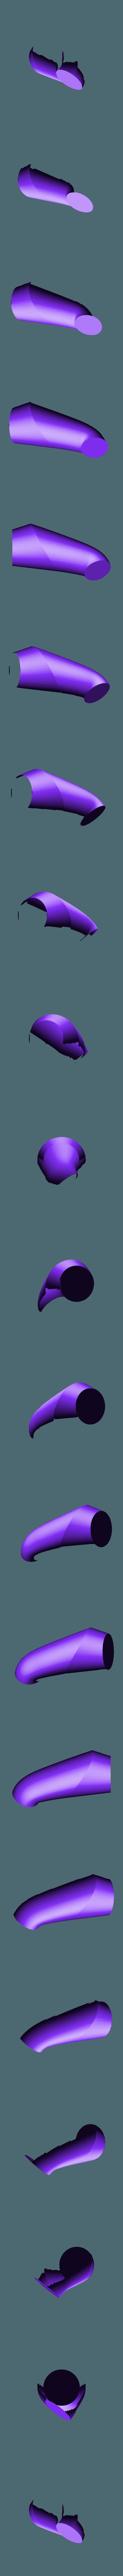 arm left.stl Download free STL file Toadette from Mario games - Multi-color • 3D printing design, bpitanga